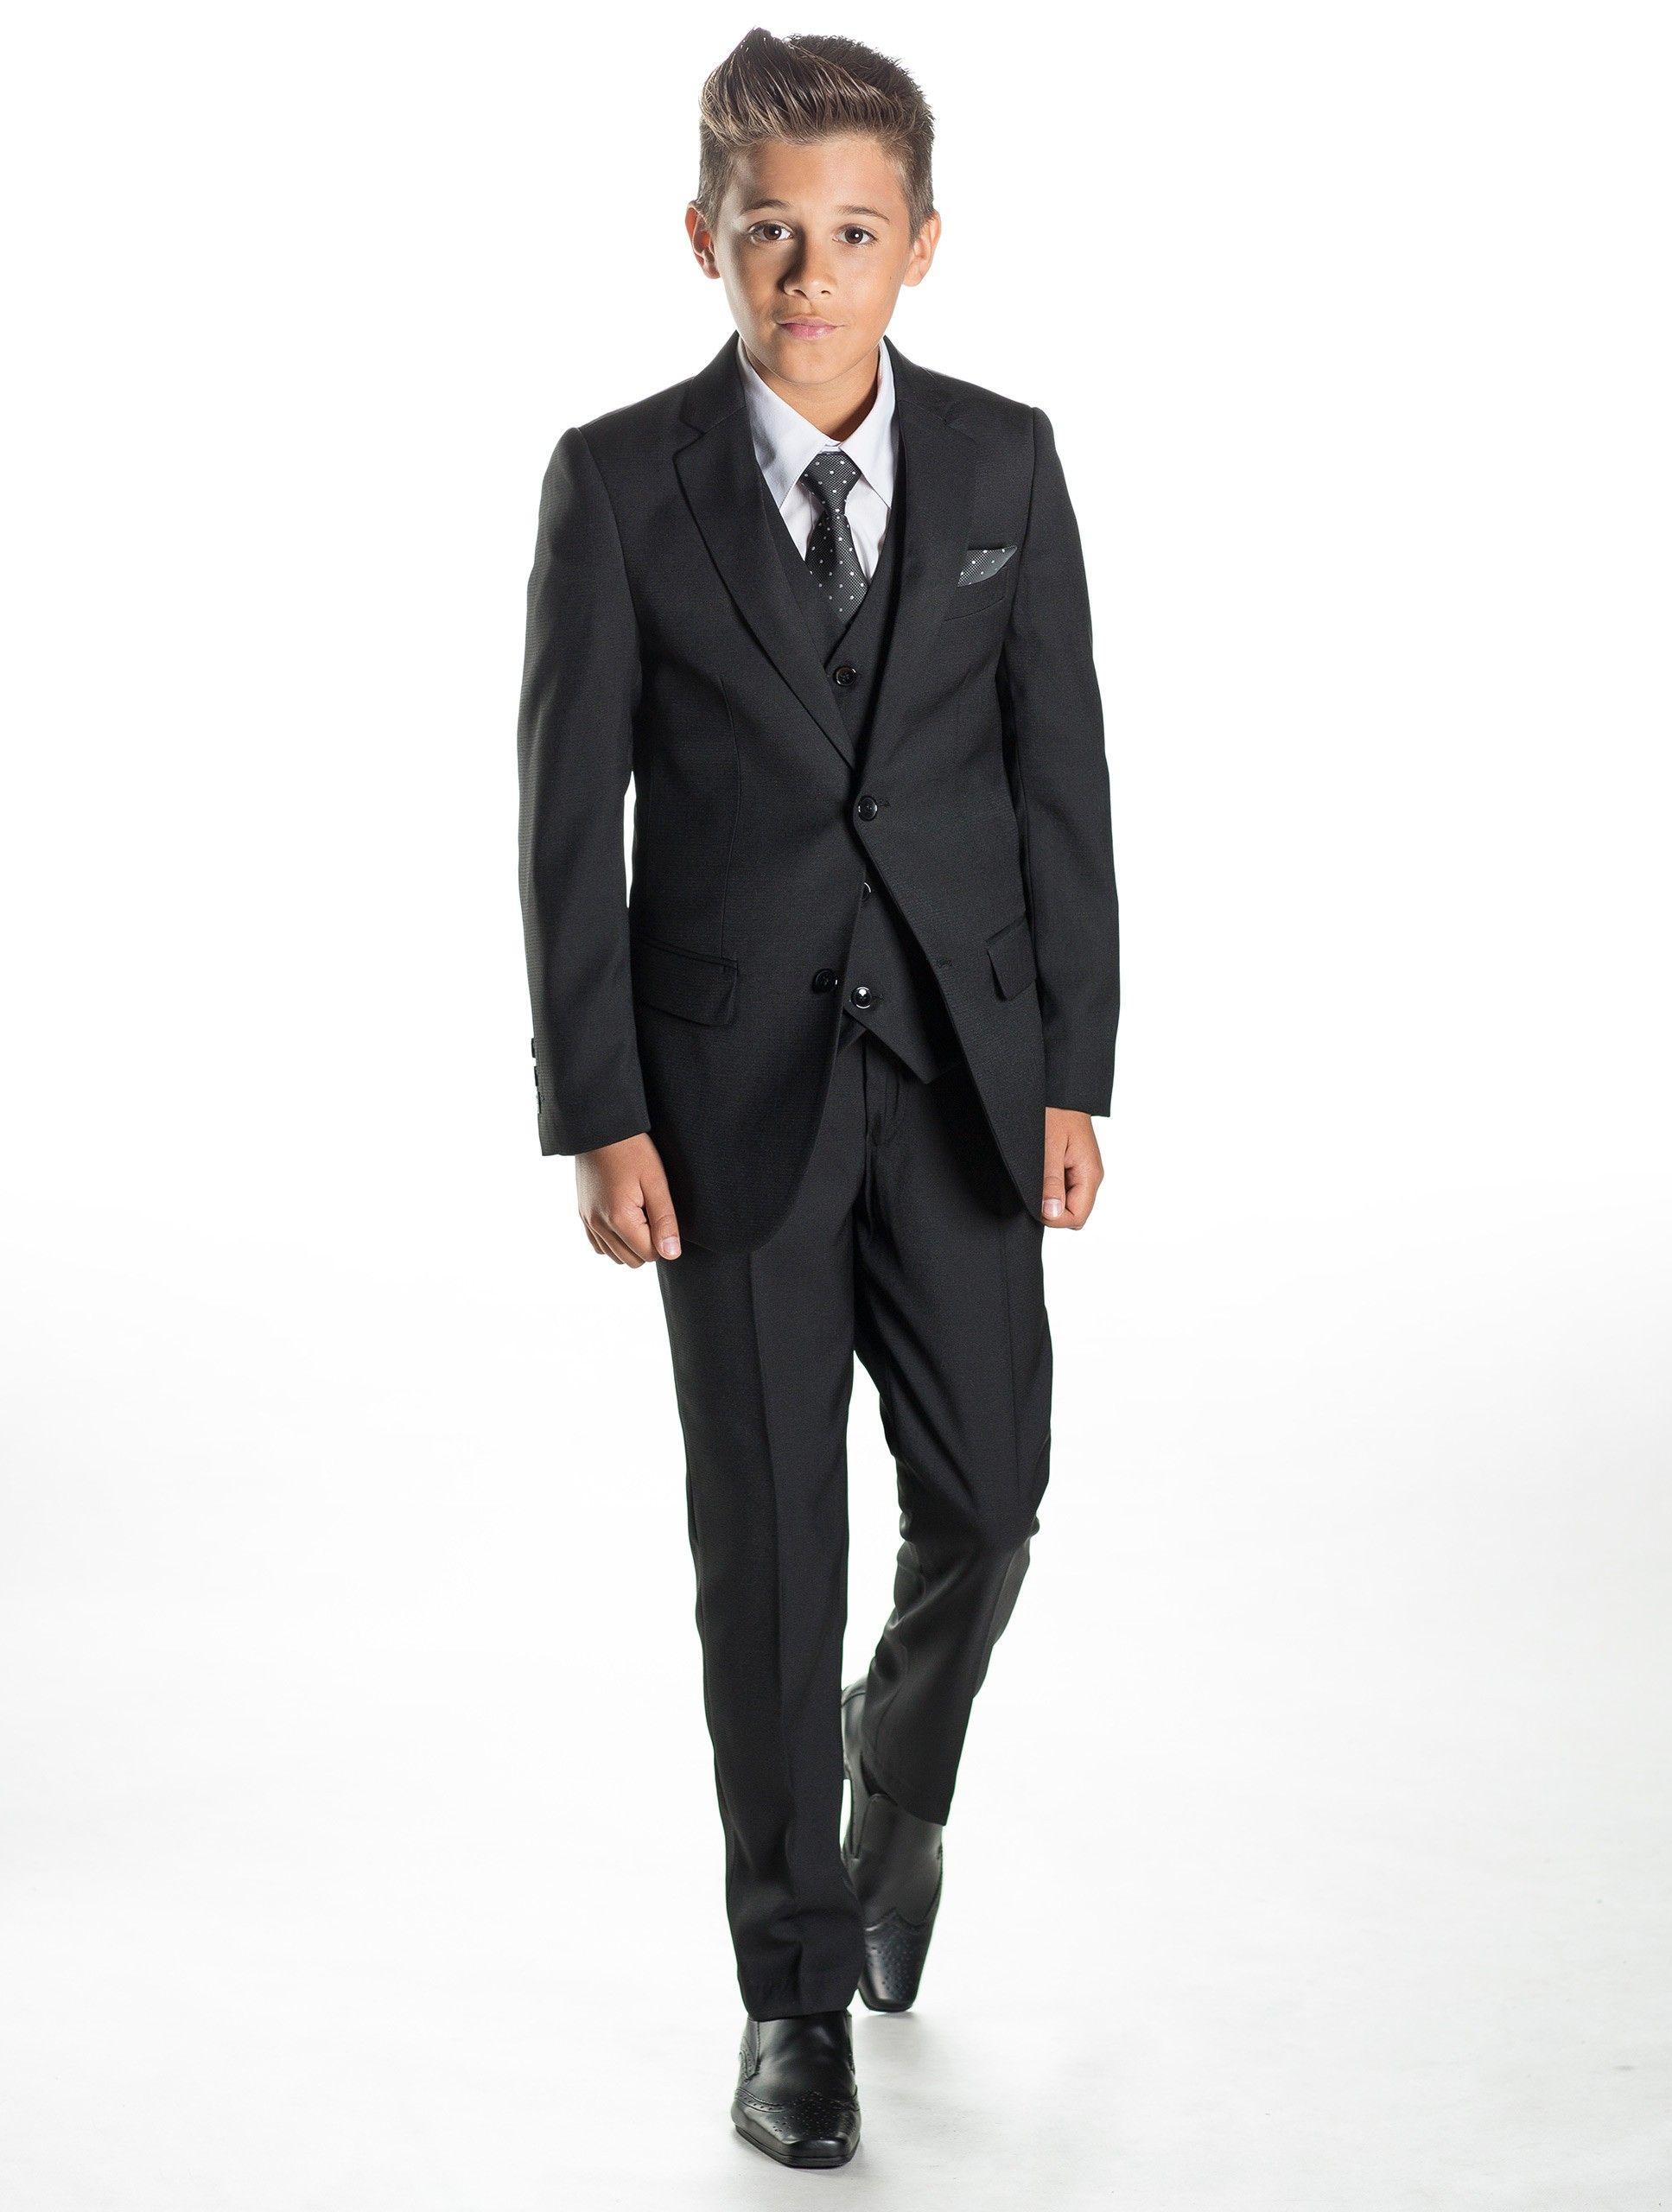 boys black suit | Classy | Pinterest